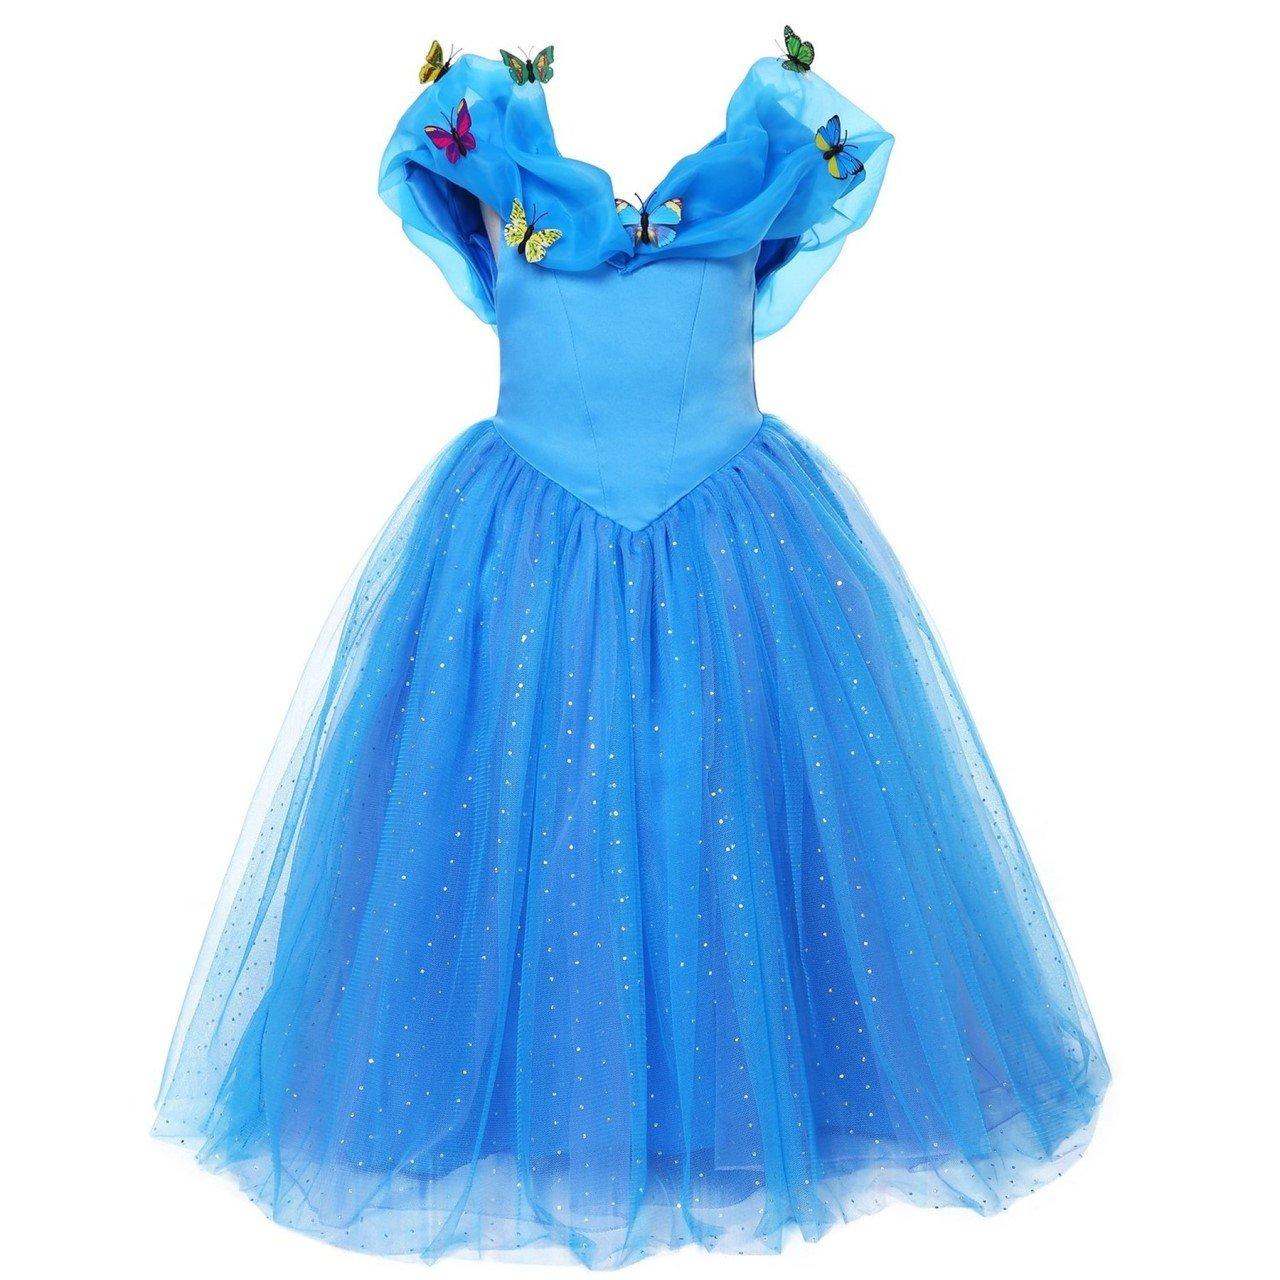 2-3 years, UK-RAP1 ELSA /& ANNA UK Girls Party Outfit Fancy Dress Snow Queen Princess Halloween Costume Cosplay Dress FBA-RAP1